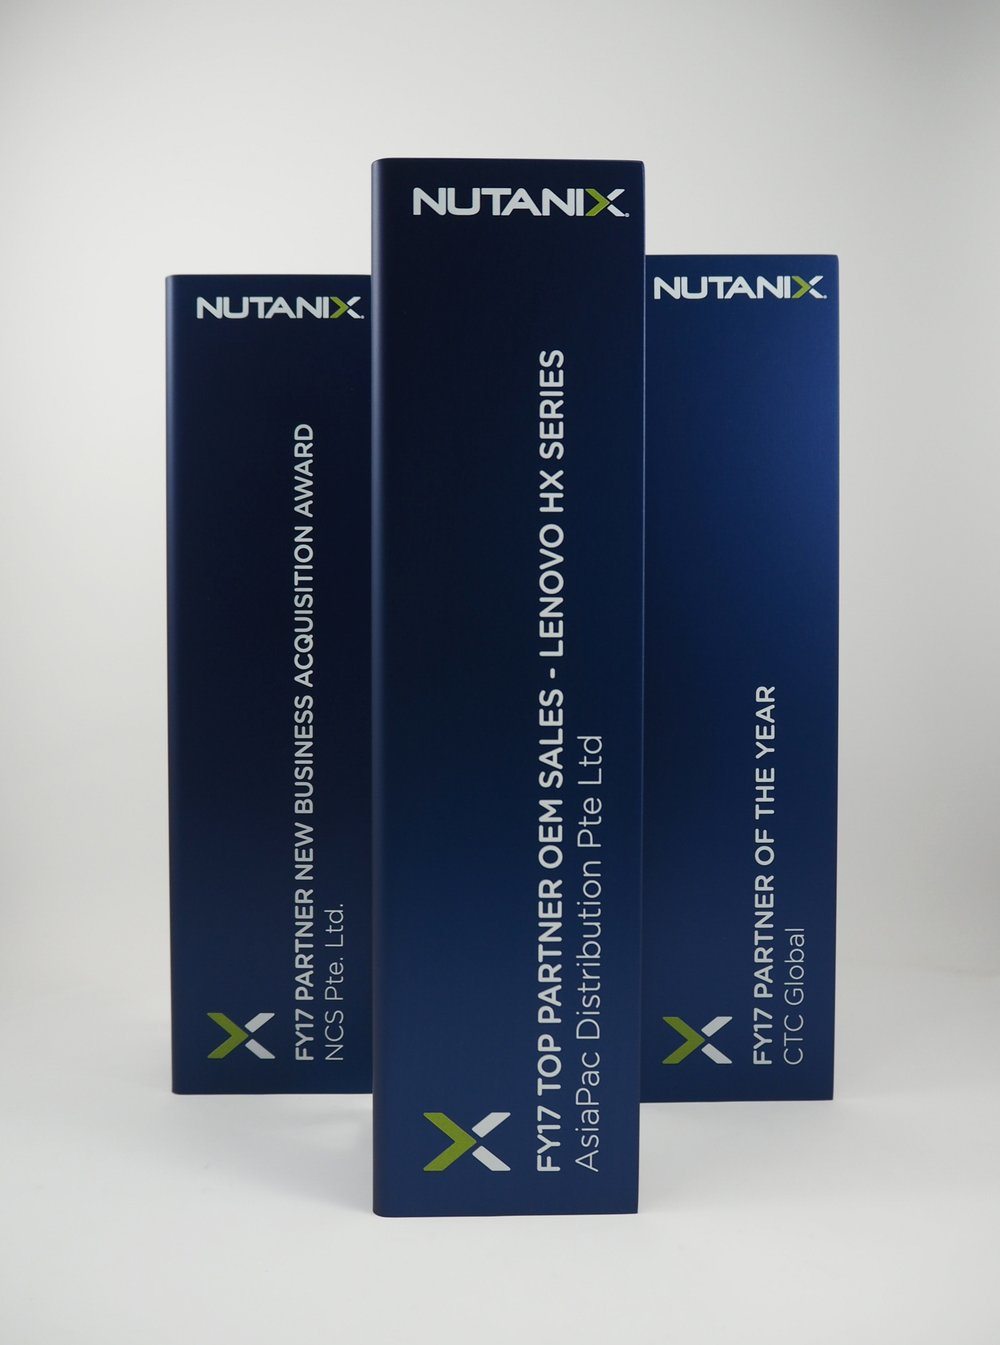 Nutanix-eco-aluminium-trophy-award-06.jpg